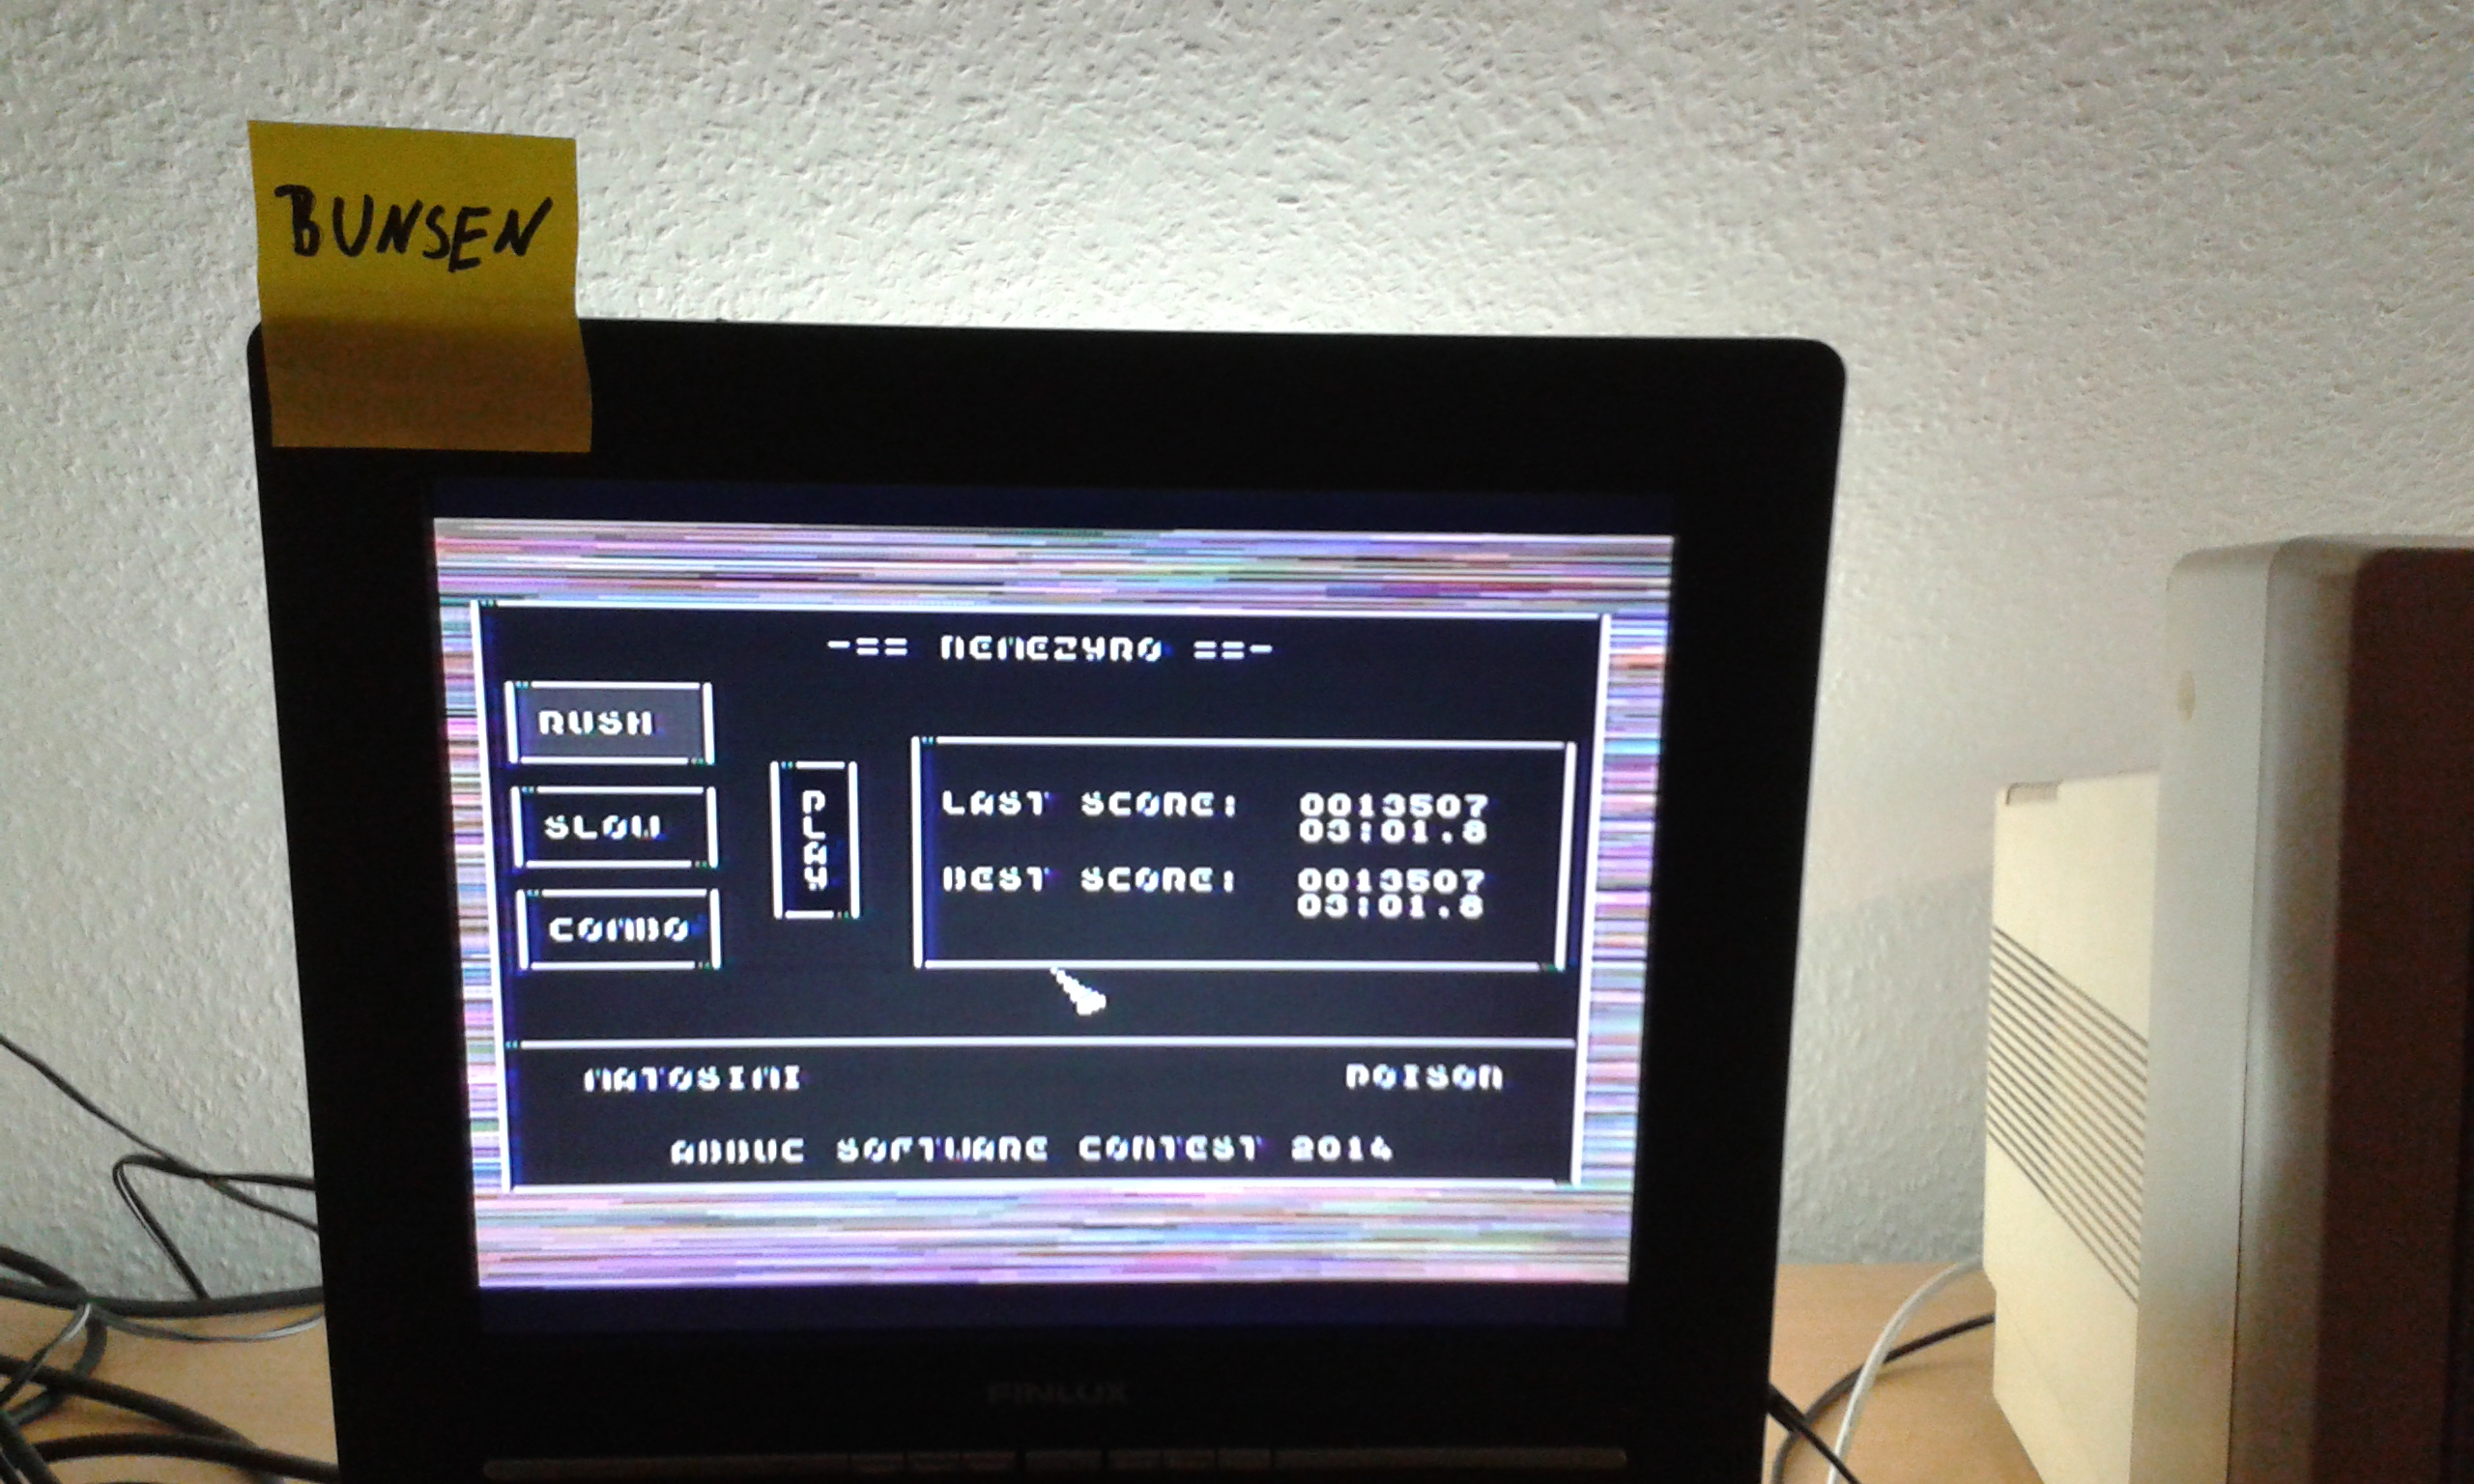 Bunsen: Nemezyro: Rush (Atari 400/800/XL/XE) 13,507 points on 2014-11-15 04:23:18